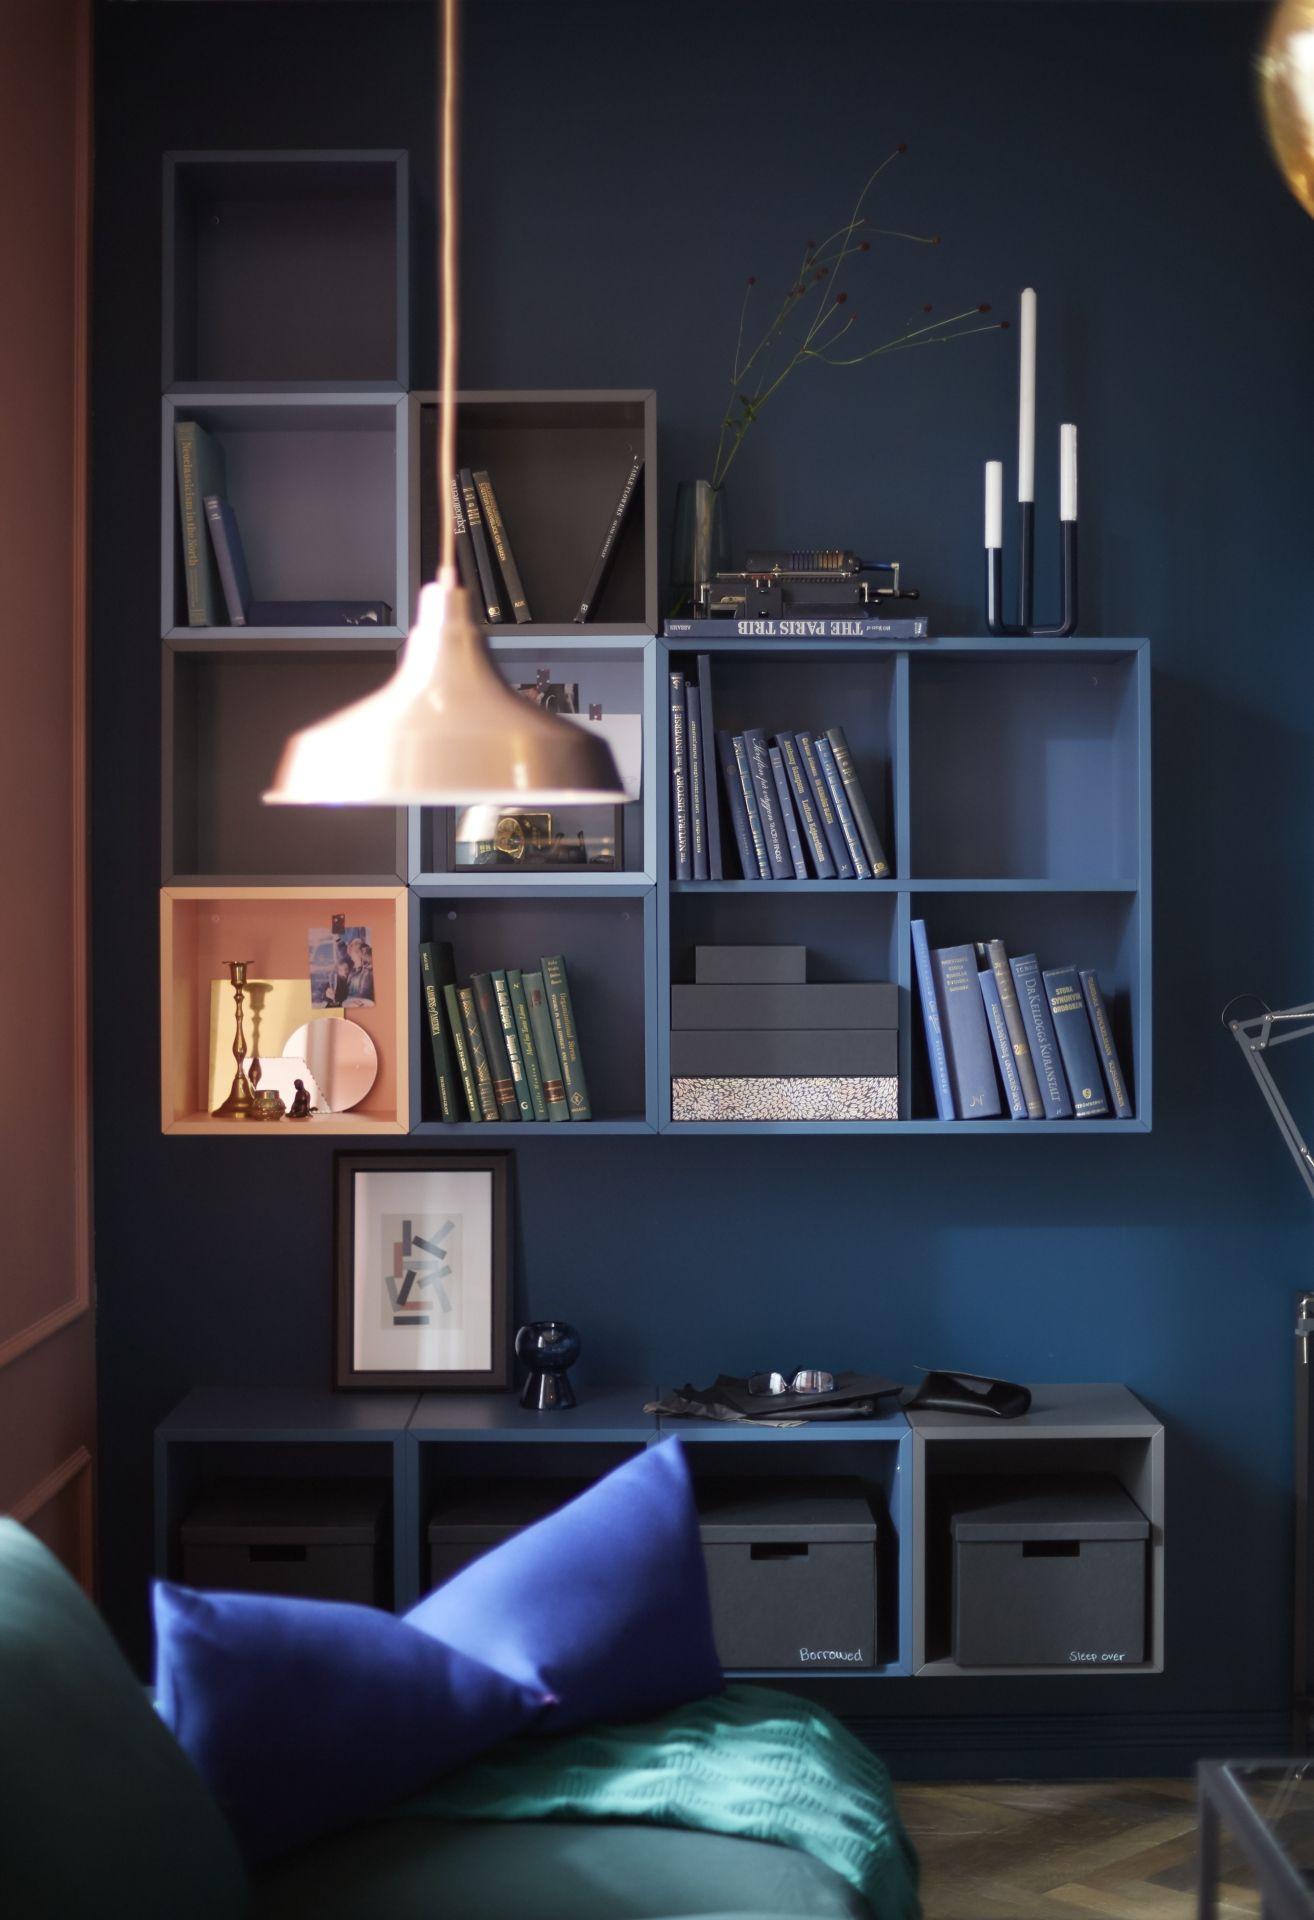 eket kastencombinatie voor wandmontage veelkleurig wall. Black Bedroom Furniture Sets. Home Design Ideas